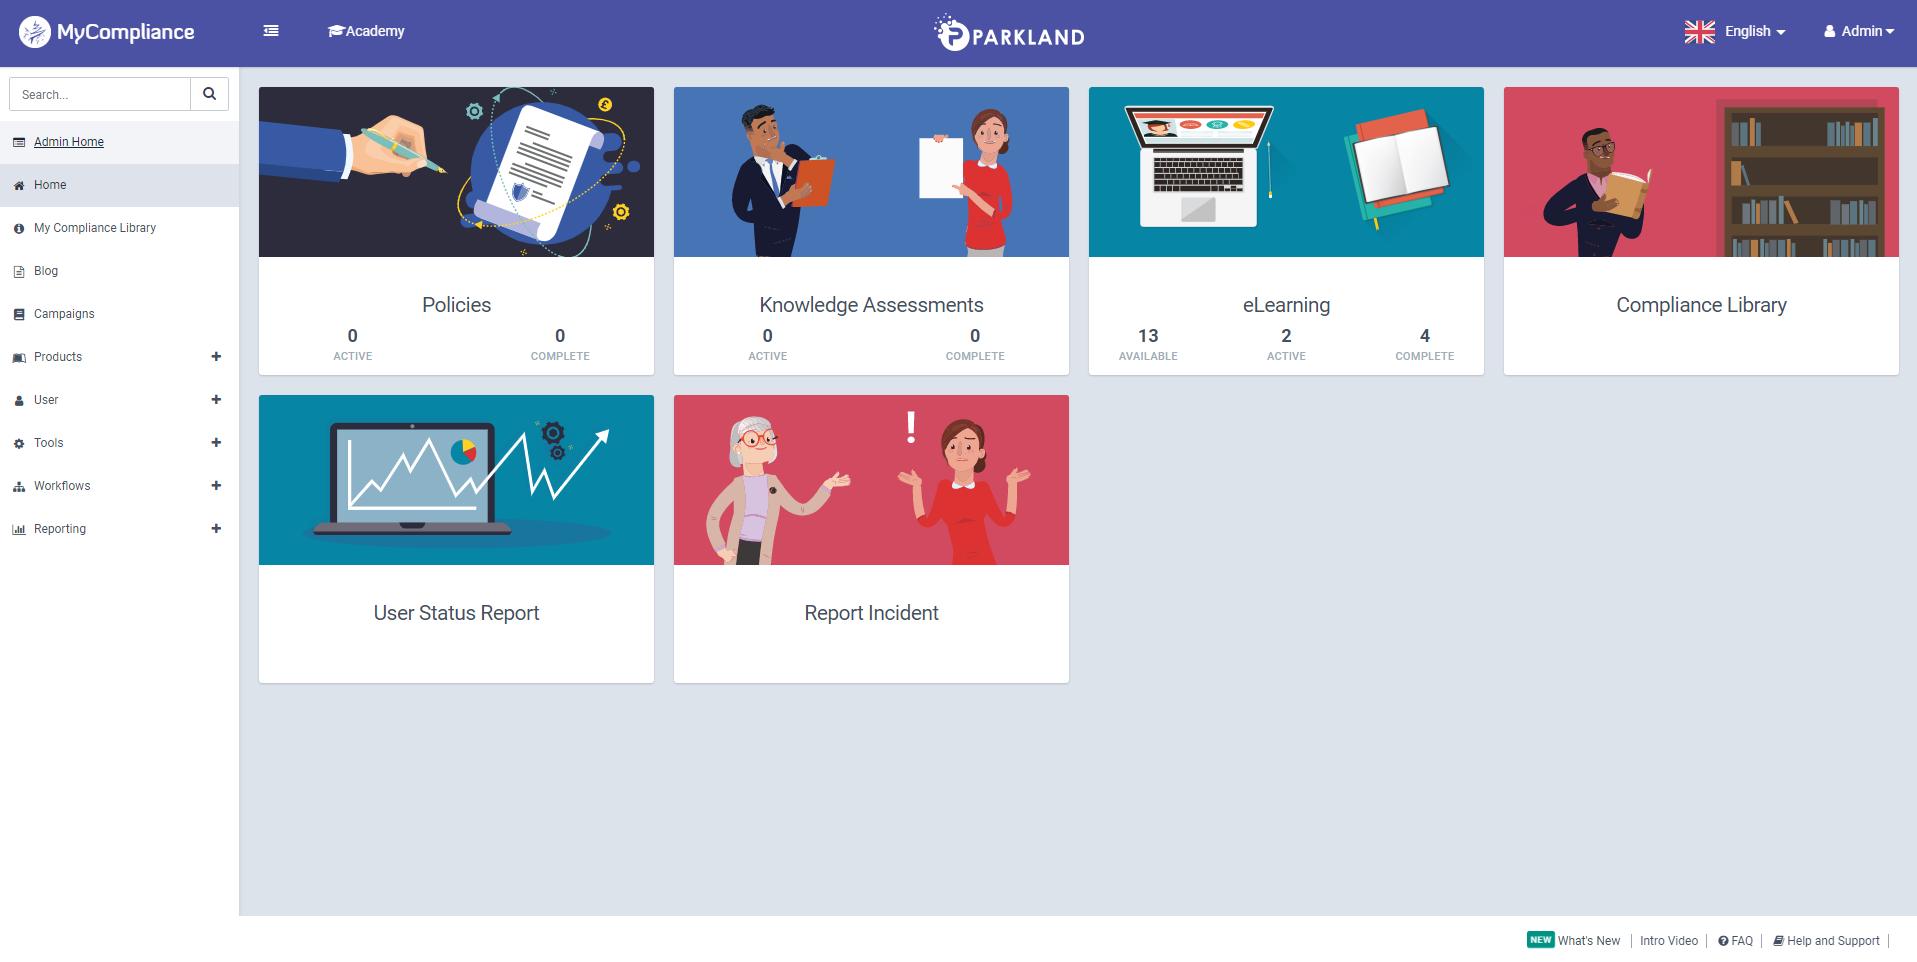 MyCompliance Homepage